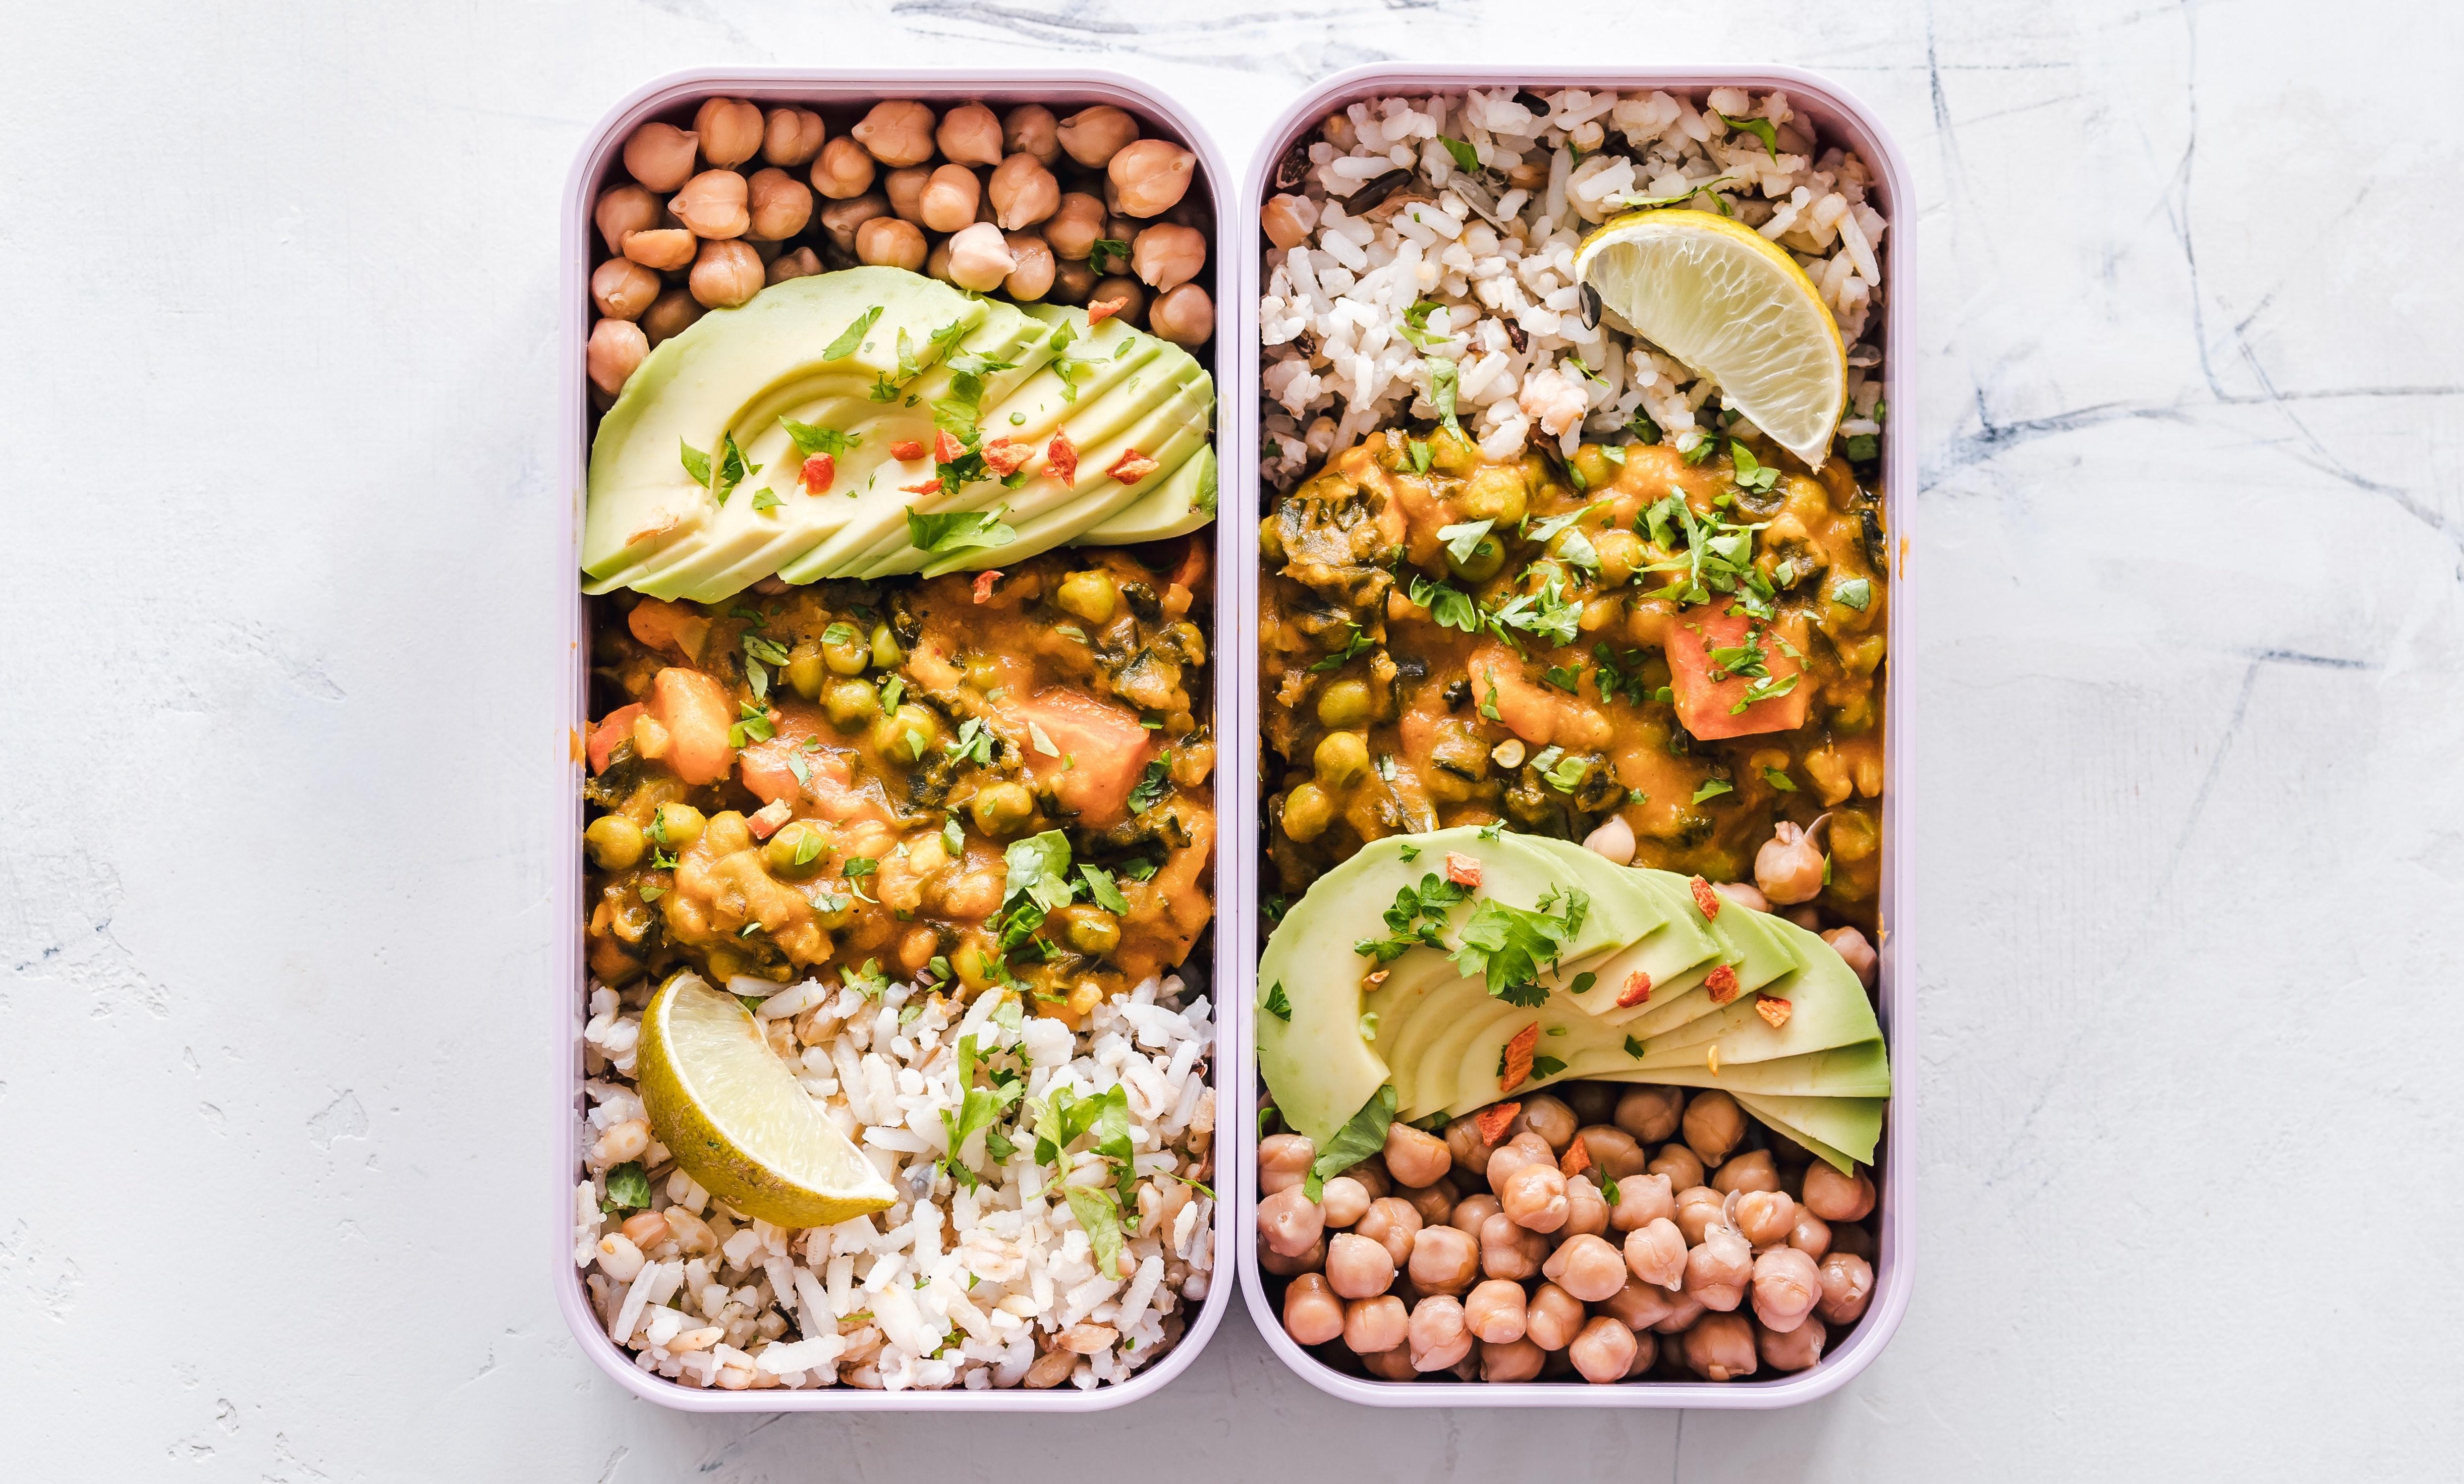 Oběd s sebou: Avokádo a vařené fazole. Zdravá strava.